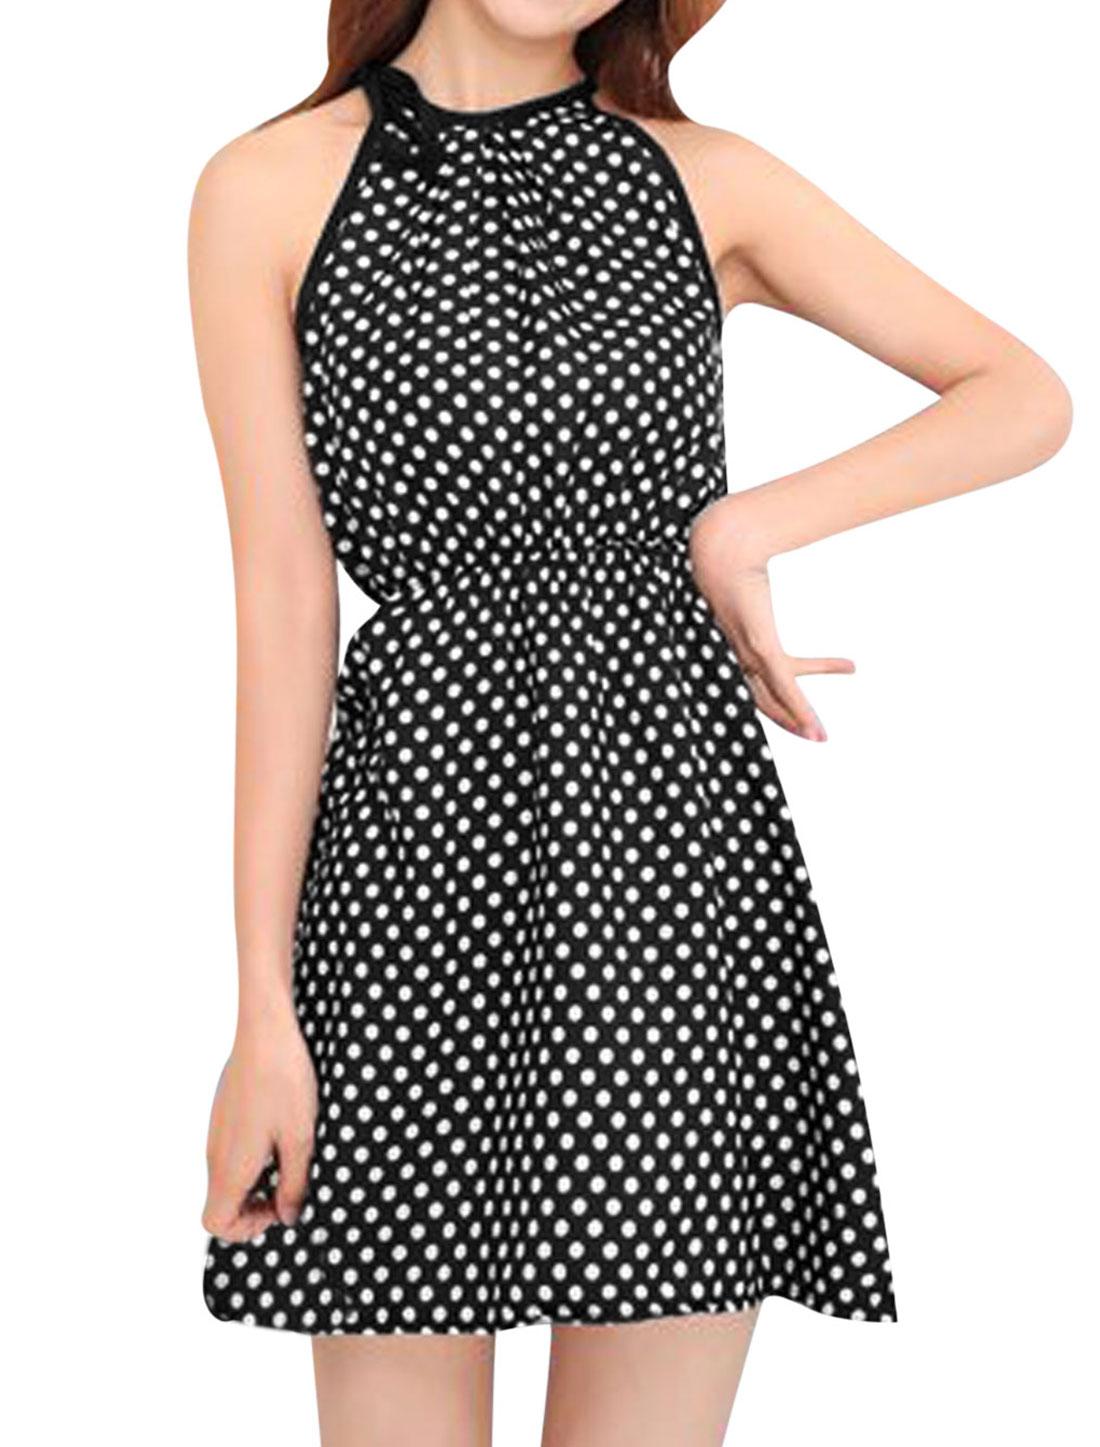 Lady Dots Prints Self Tie Detail Cut Out Back Casual Sundress Black White XS